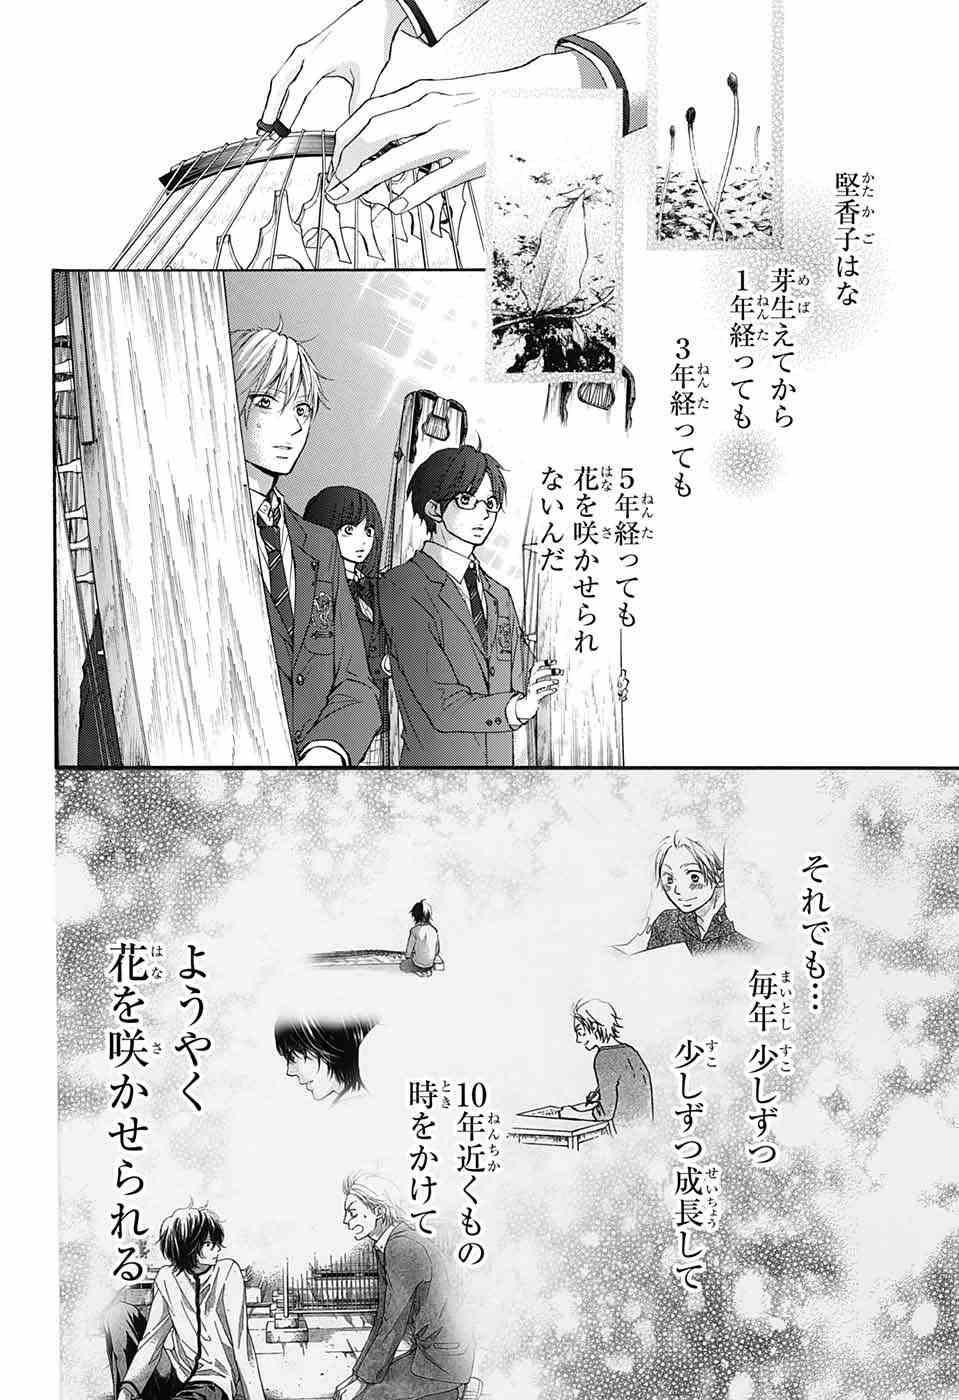 Kono Oto Tomare! - Chapter 49 - Page 44